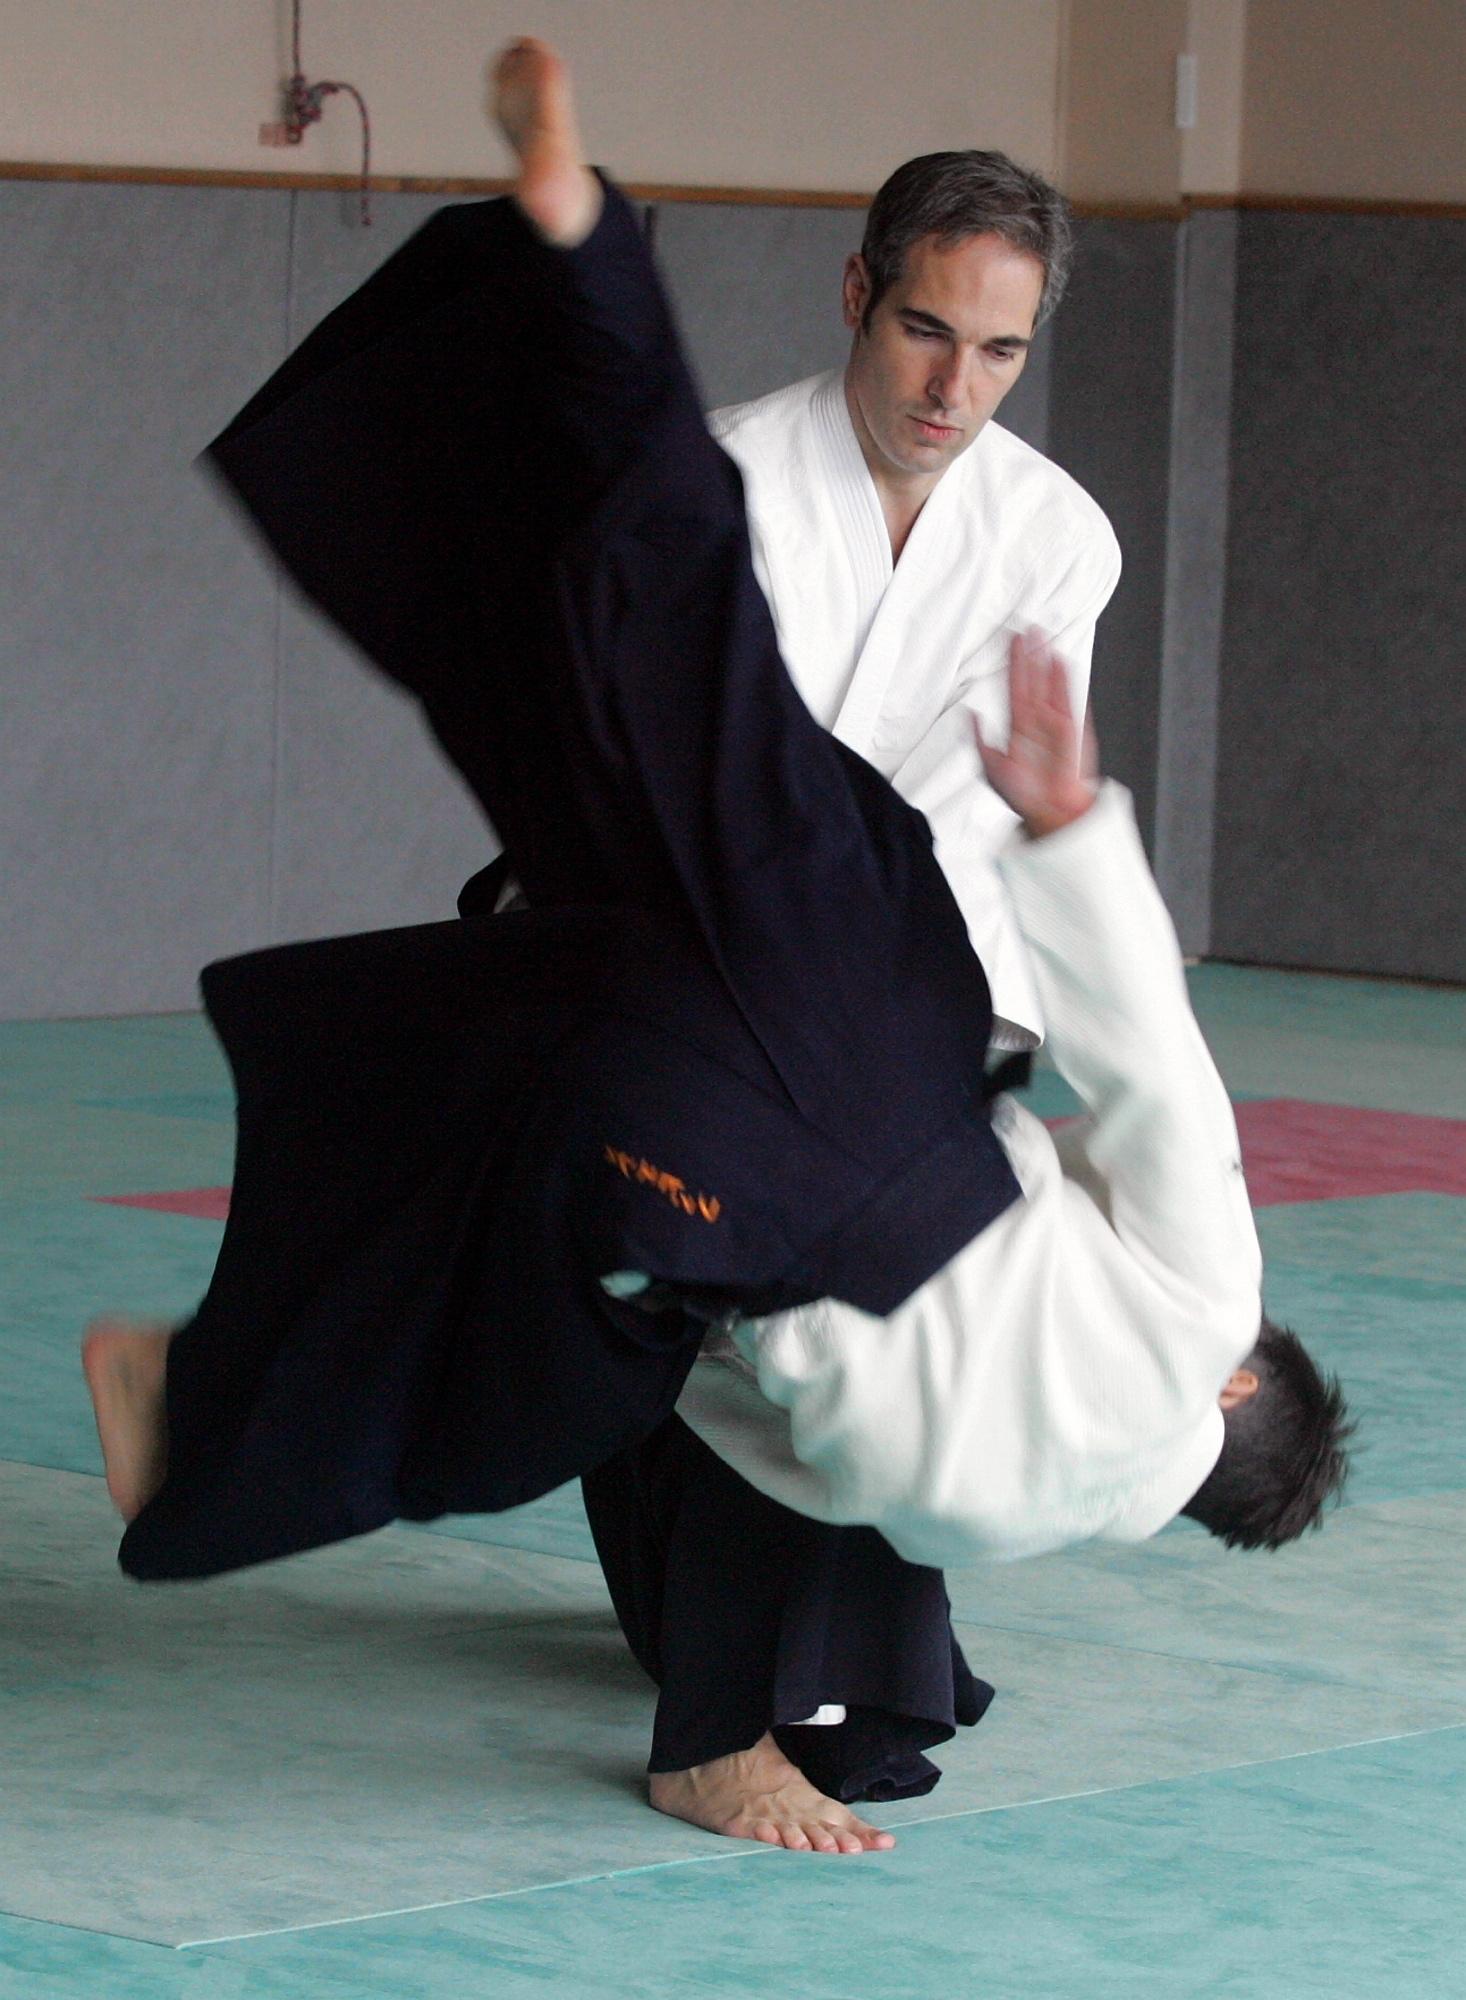 Eric en plein cours d'Aïkido